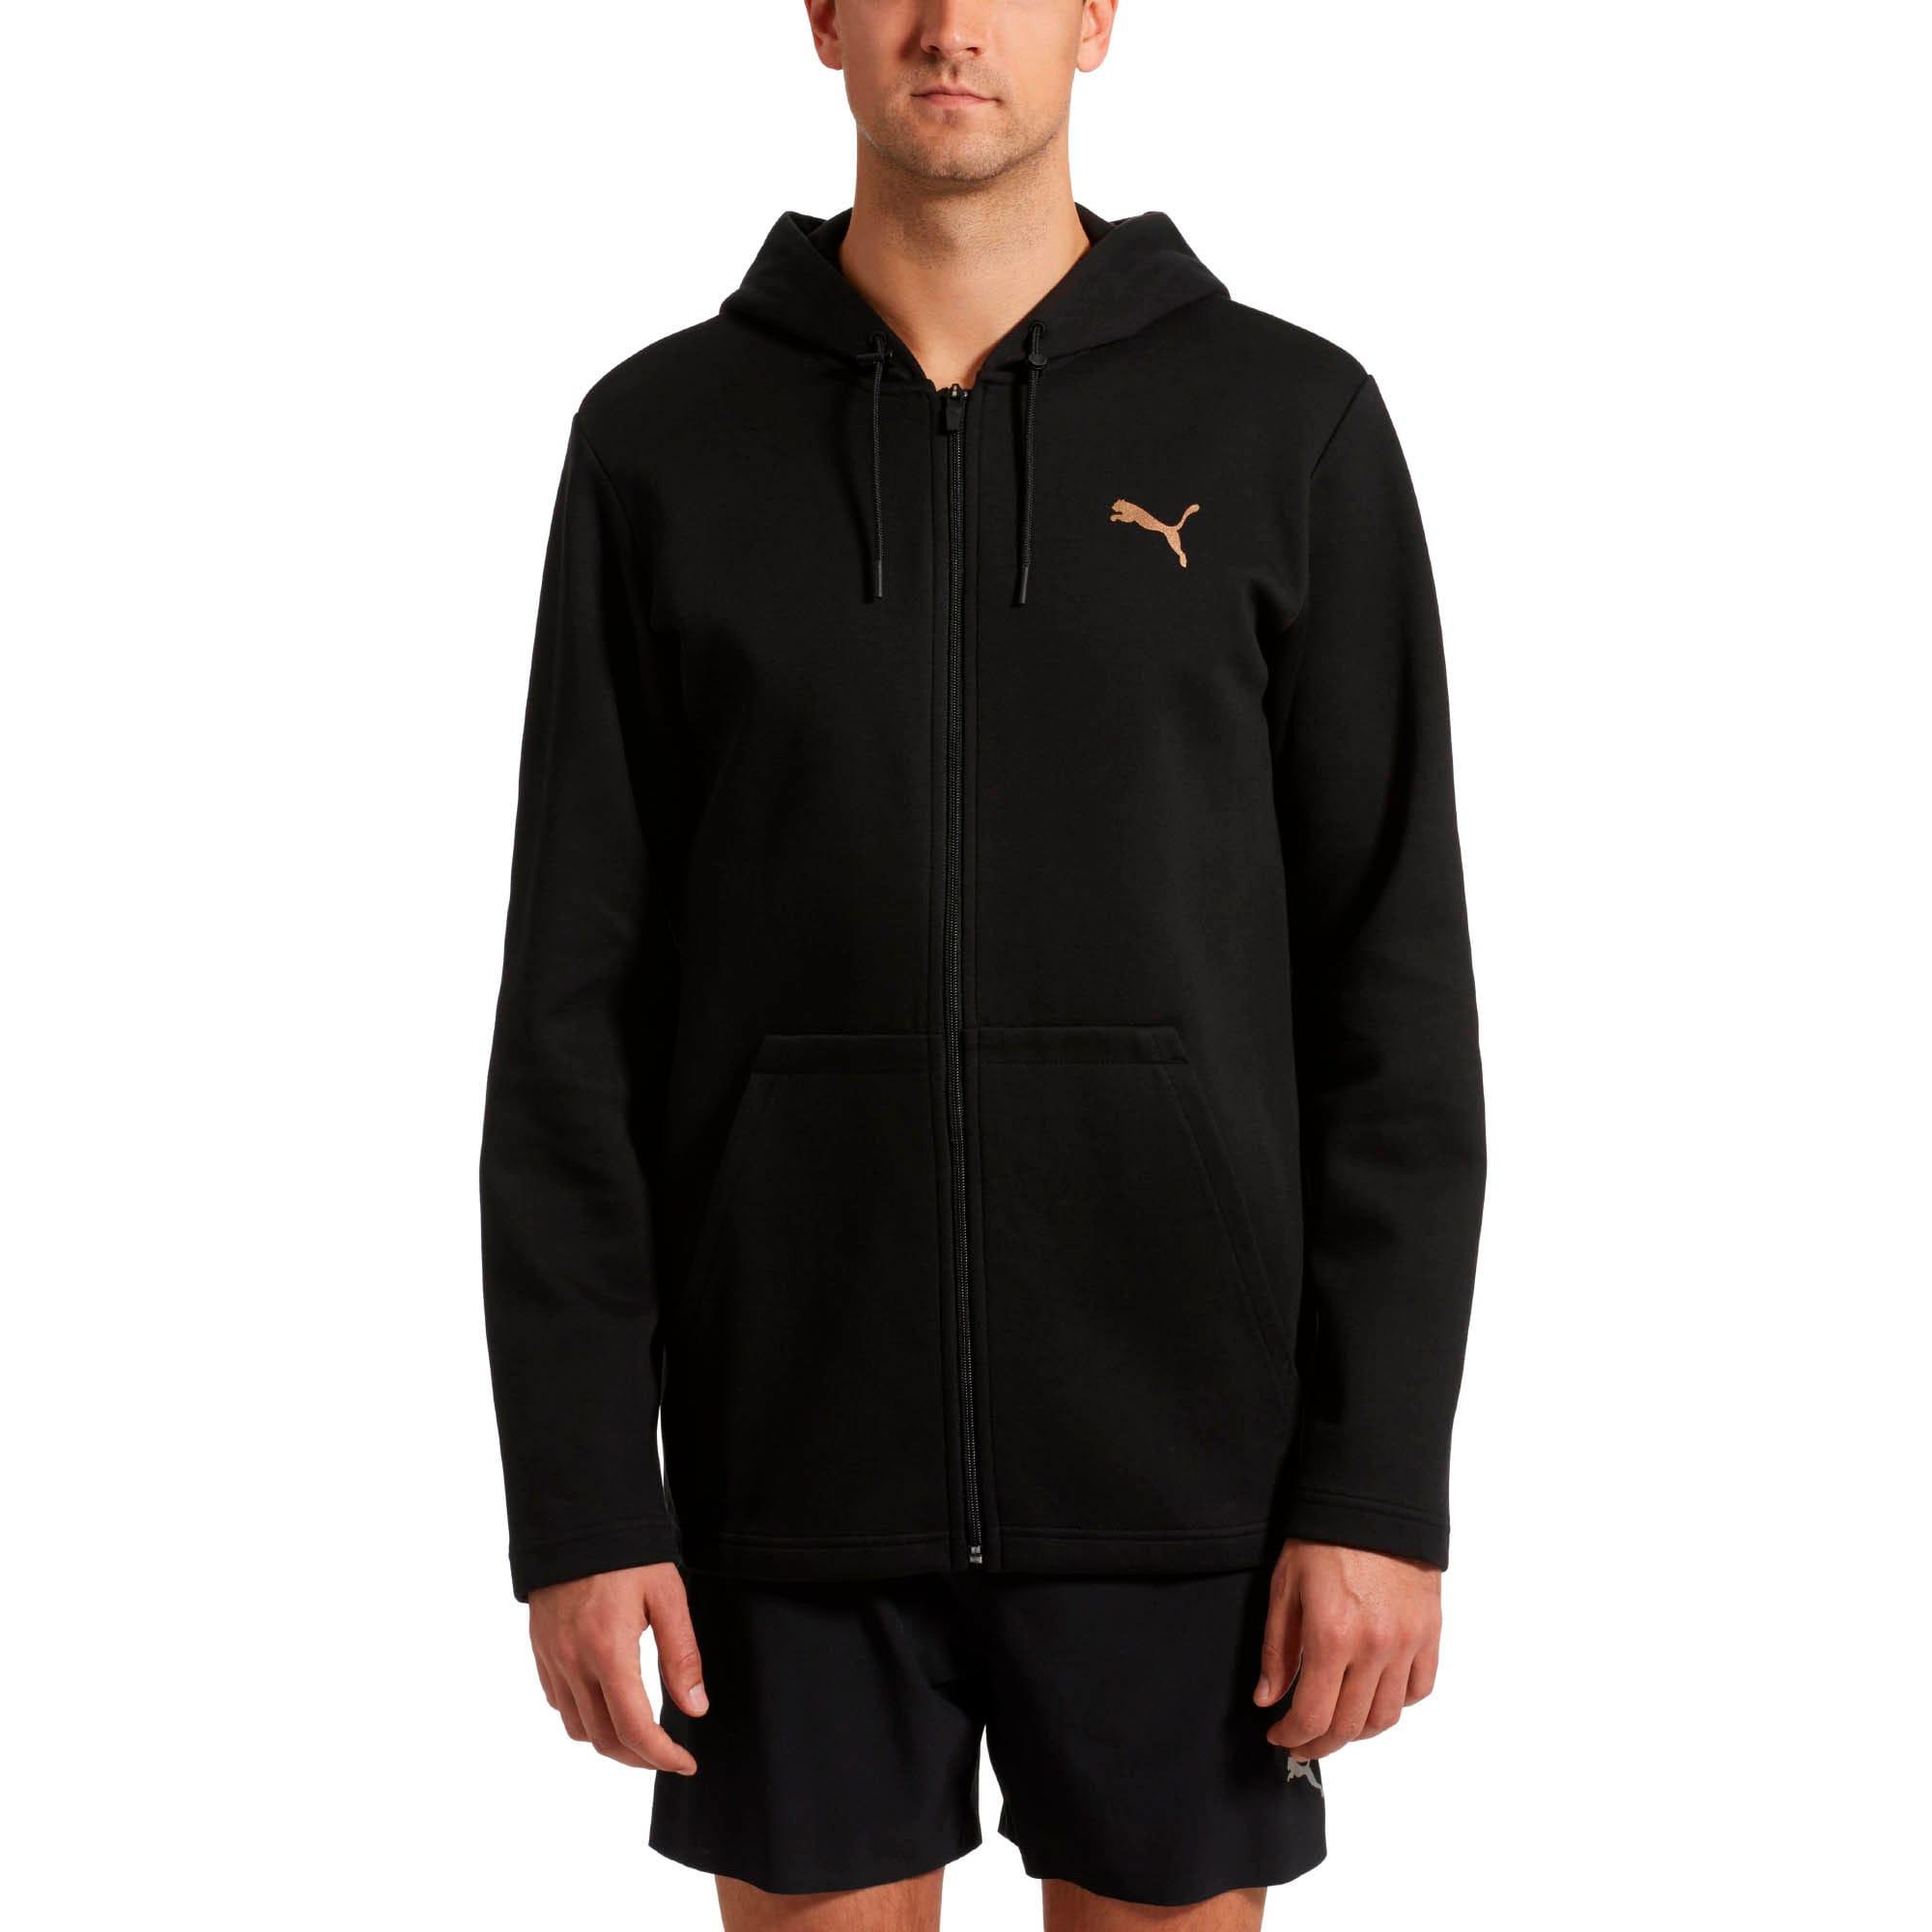 Thumbnail 2 of VENT Zip-Up Hooded Men's Jacket, Puma Black, medium